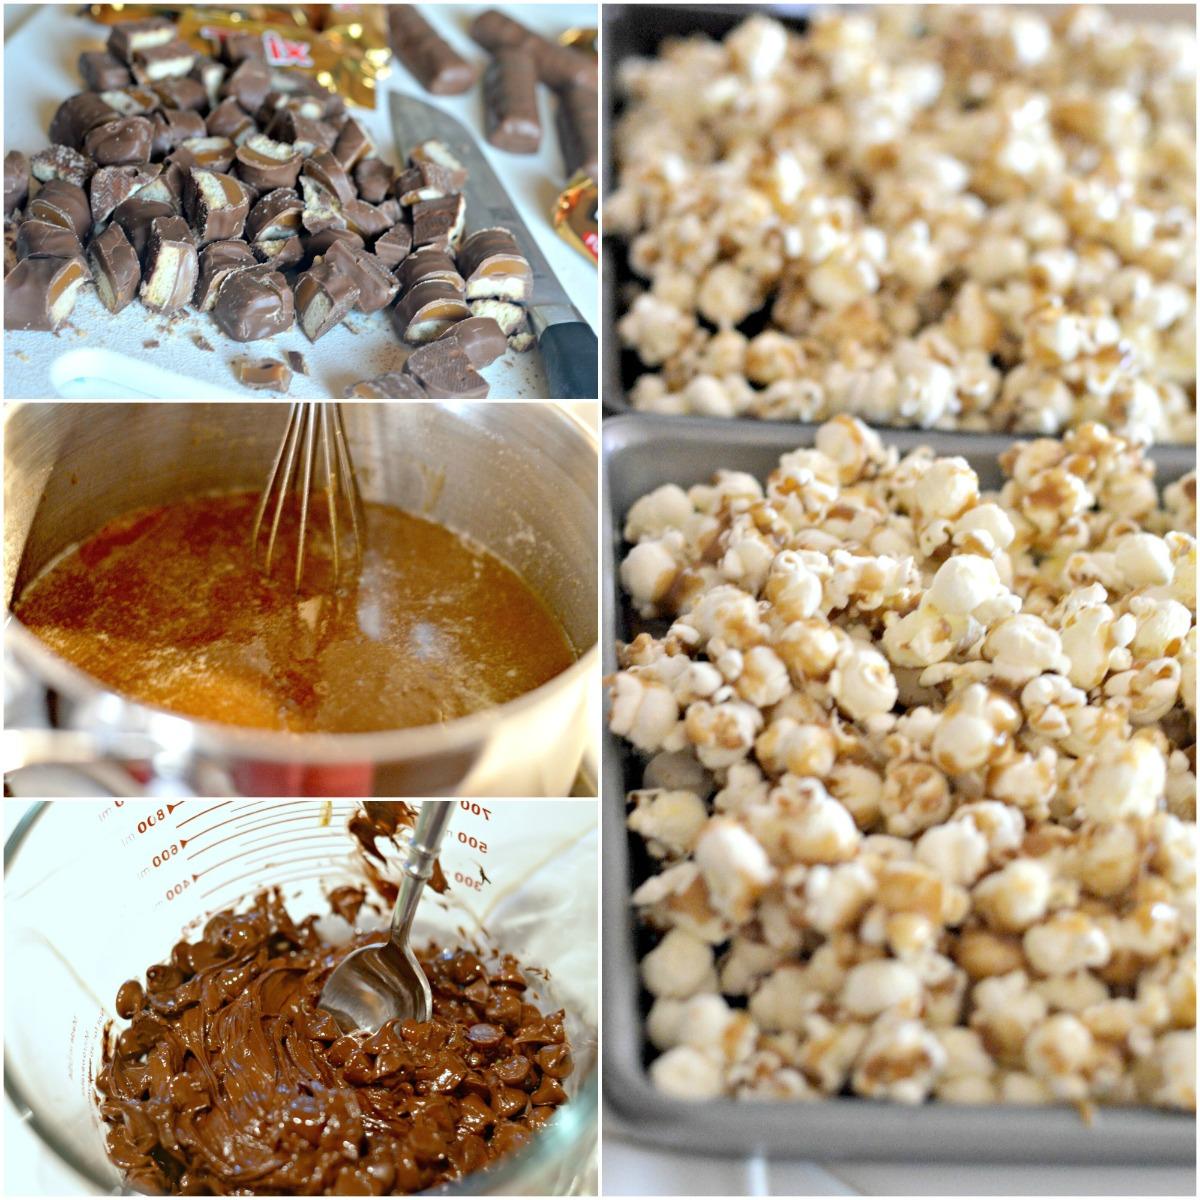 twix caramel popcorn recipe – the steps to make the Twix popcorn recipe